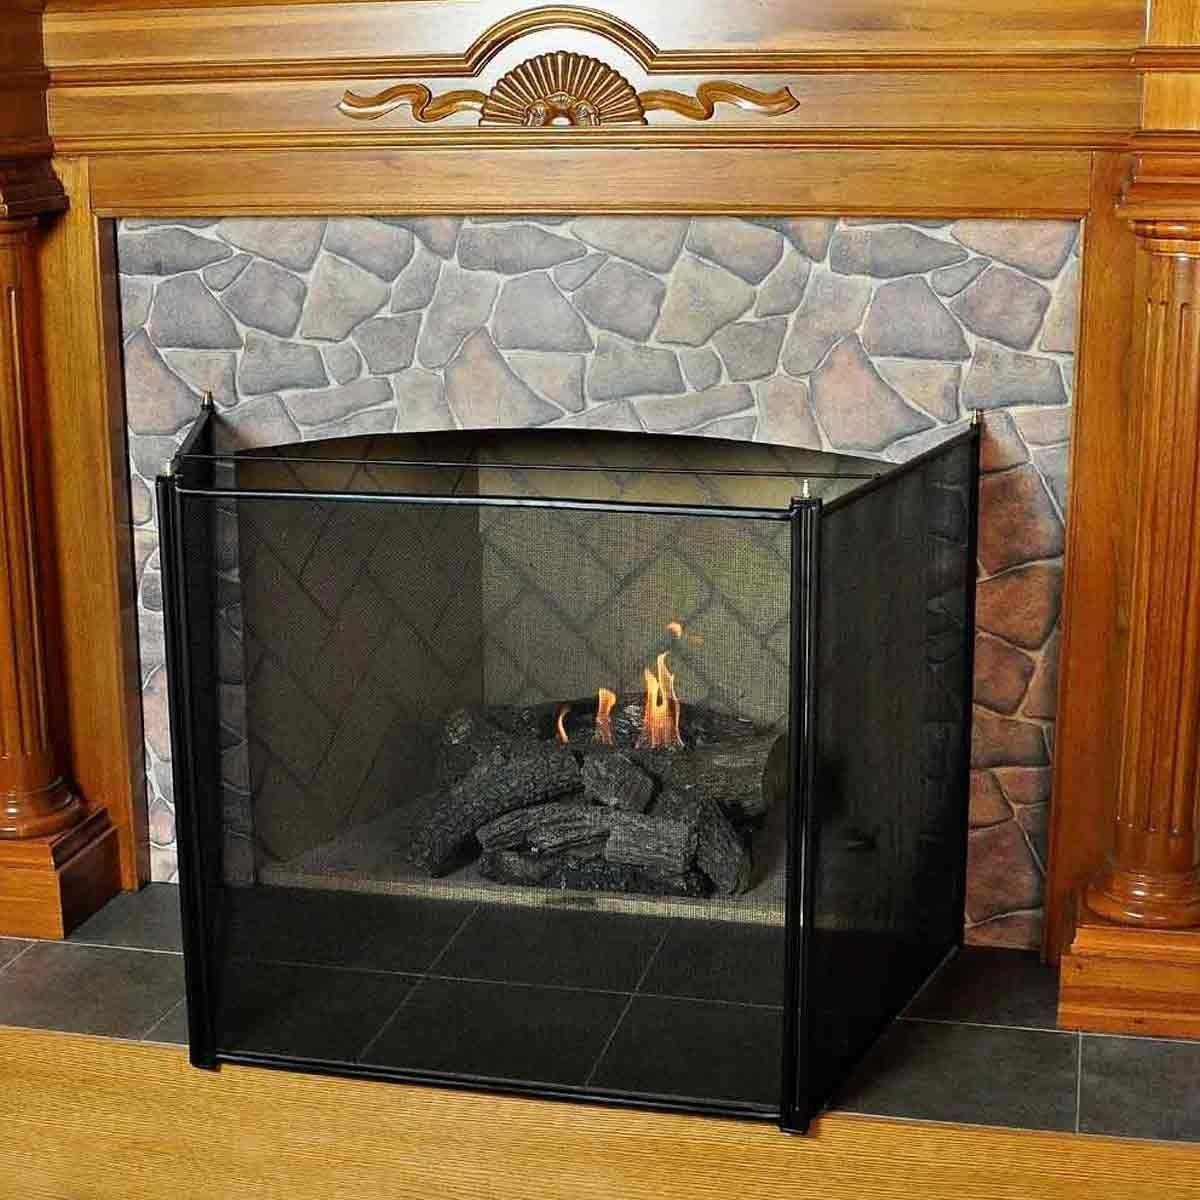 3 Fold Child Guard Fireplace Screen  Baby Proof Fireplace